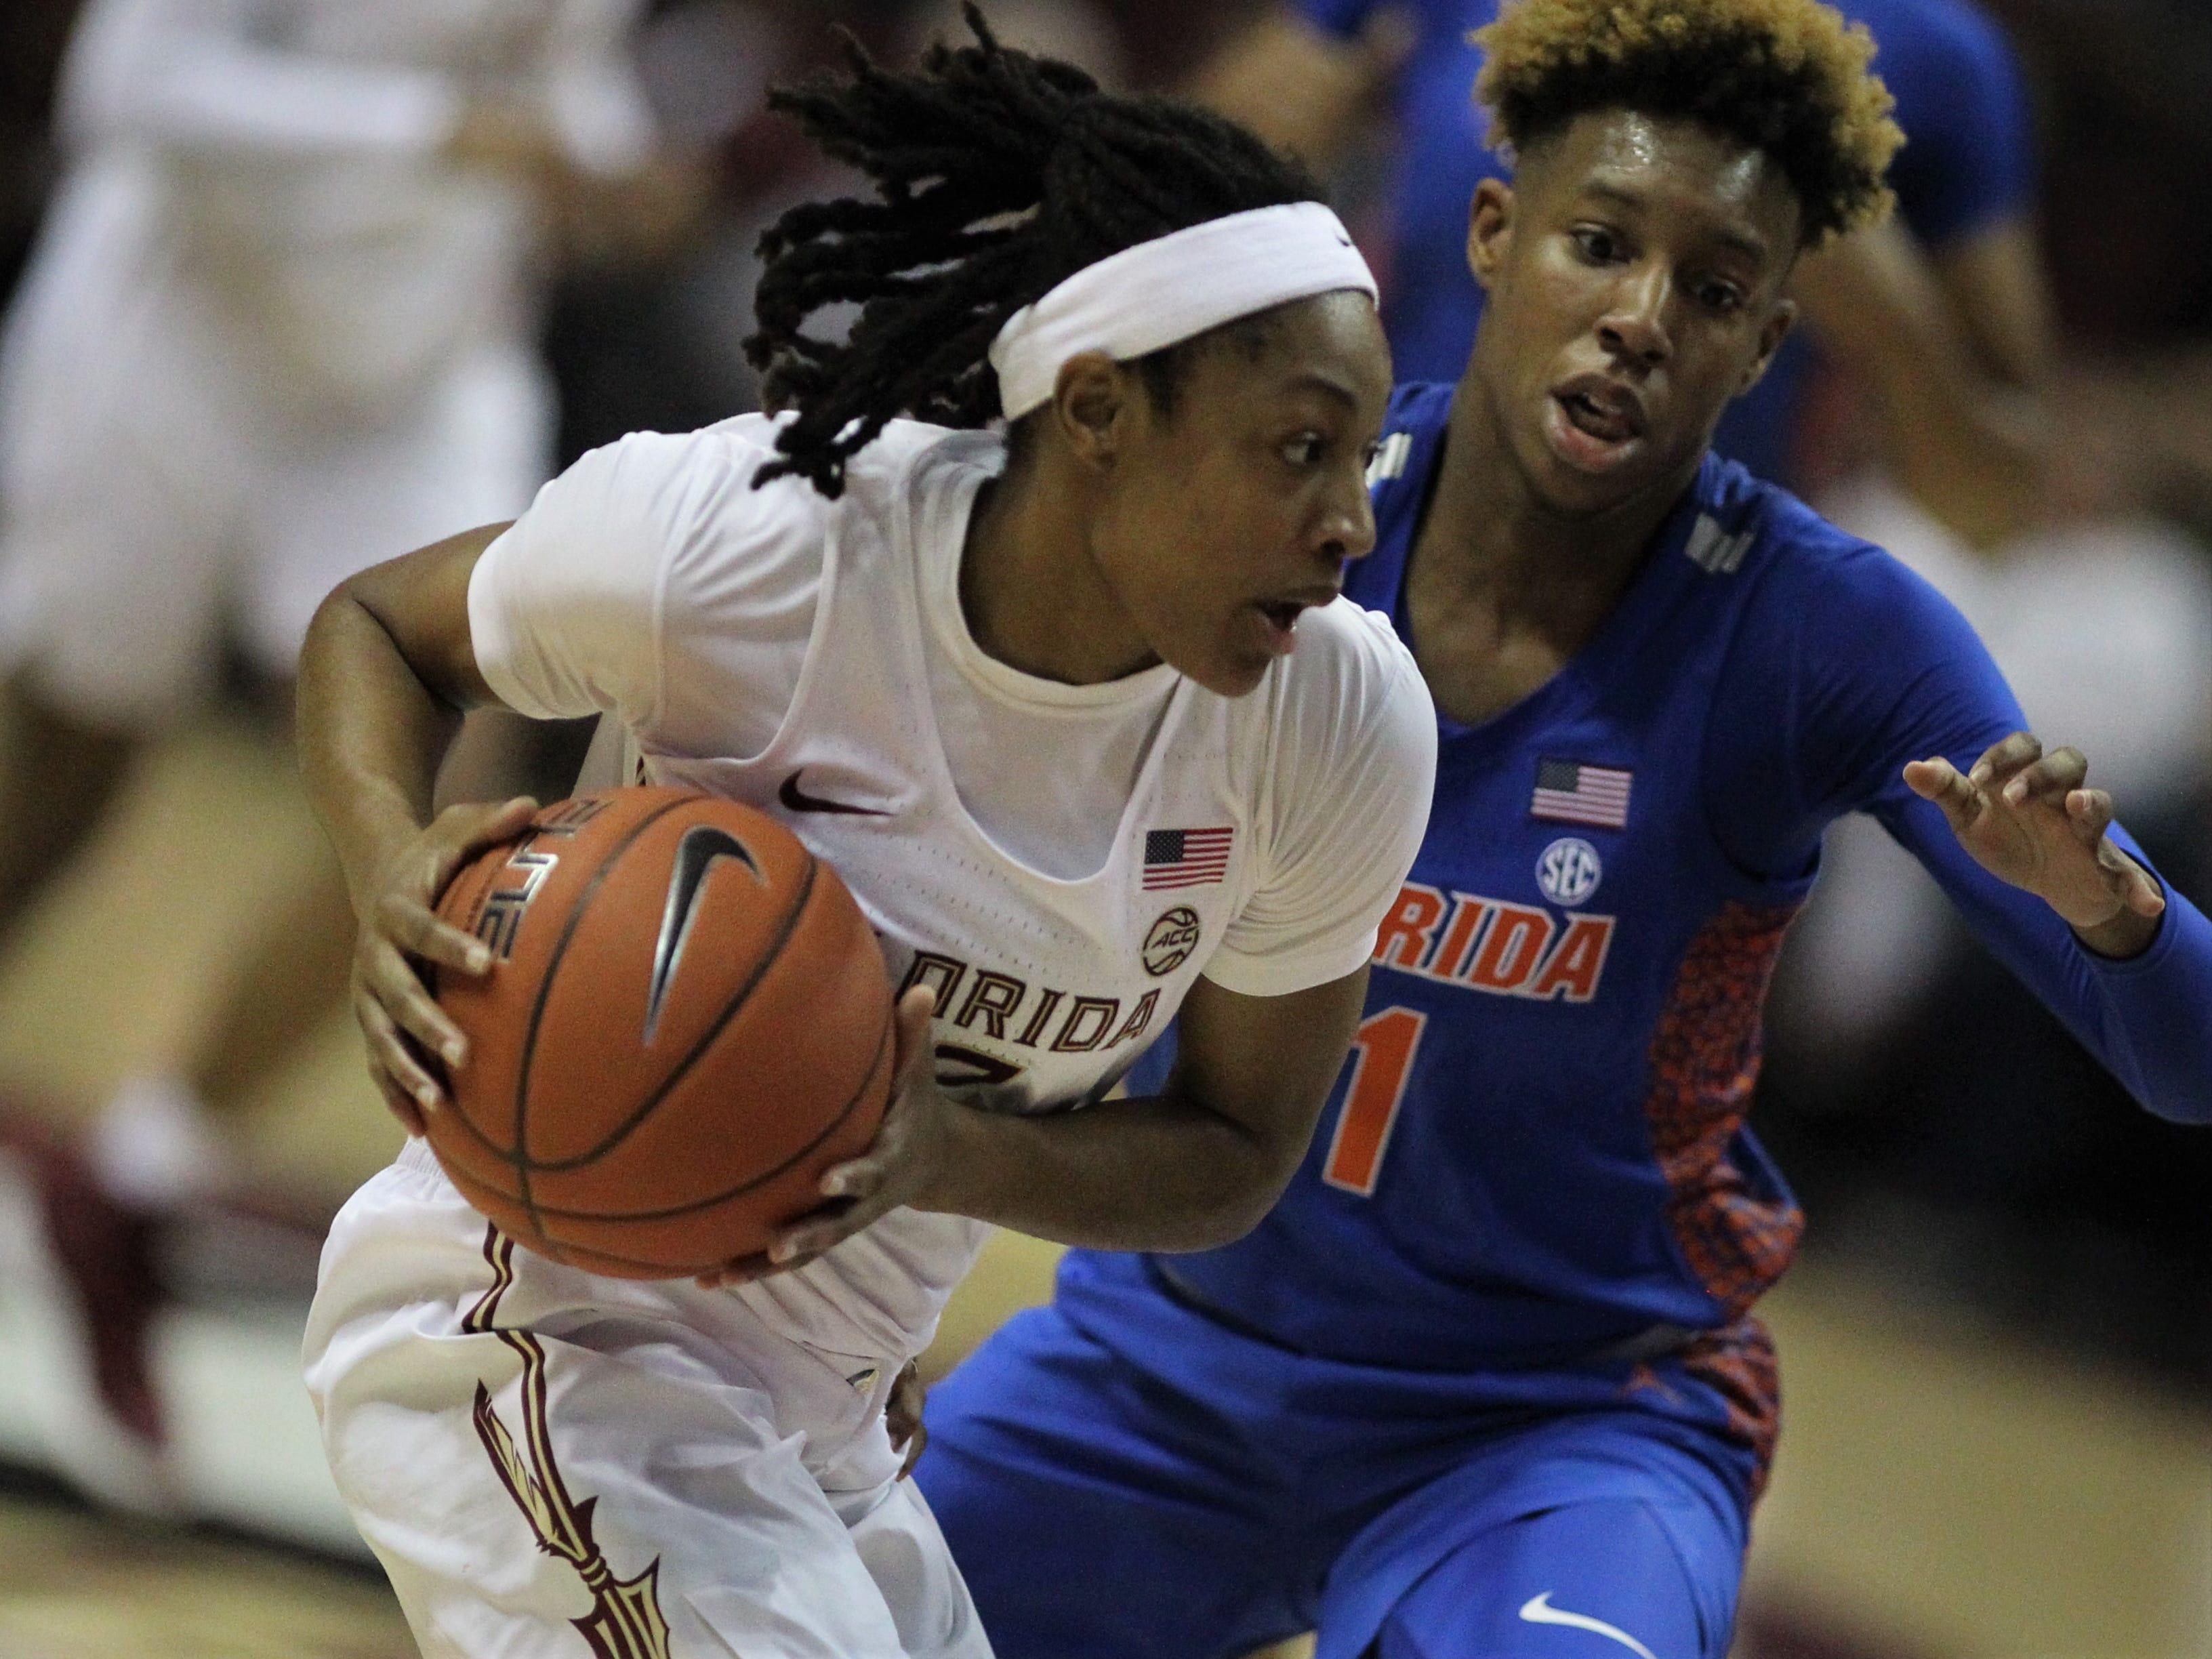 Florida State Seminoles vs. Florida Gators, women's basketball   PHOTOS